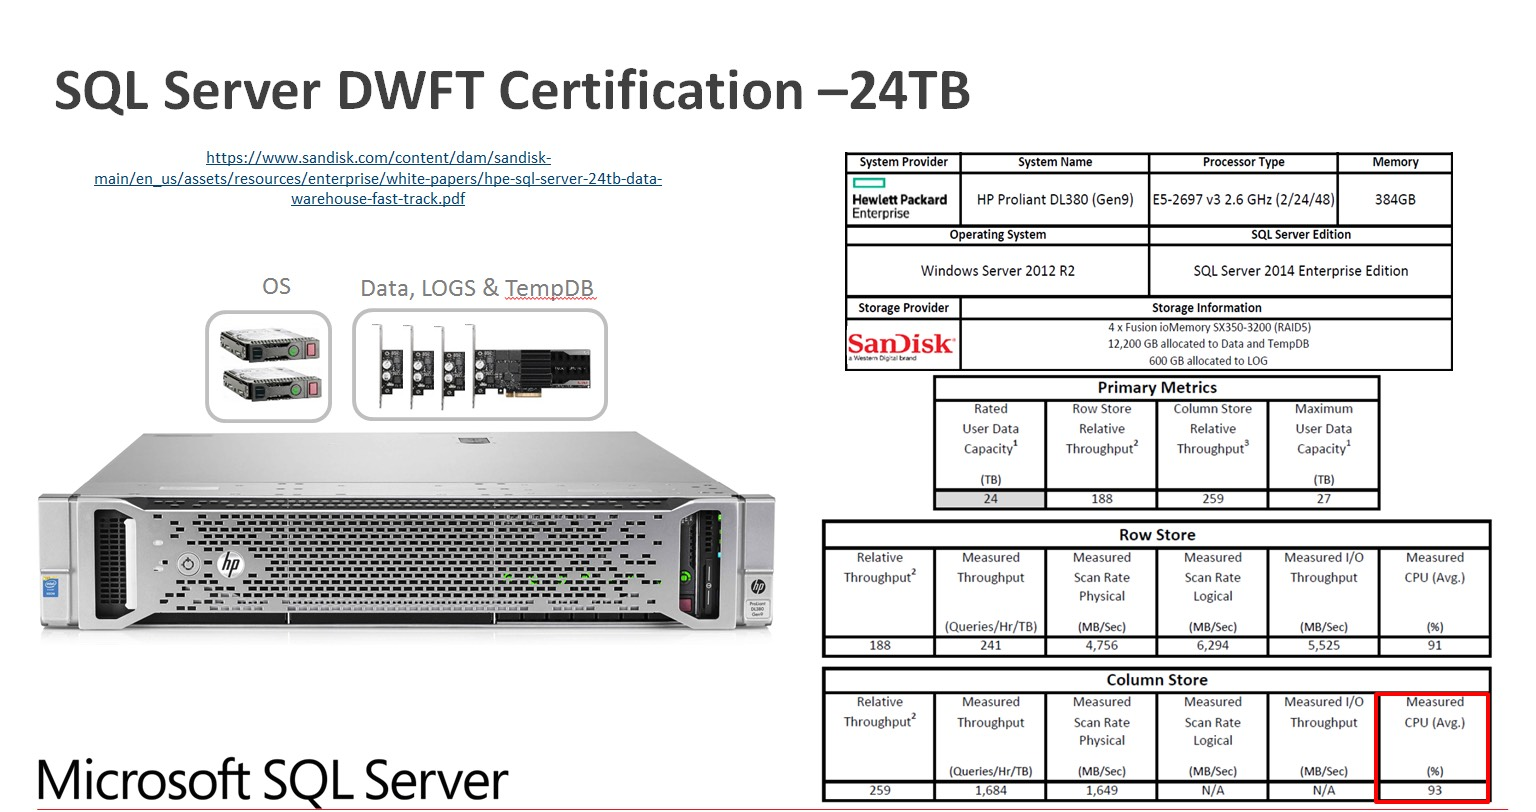 SQL Server DWFT Certification - 24TB